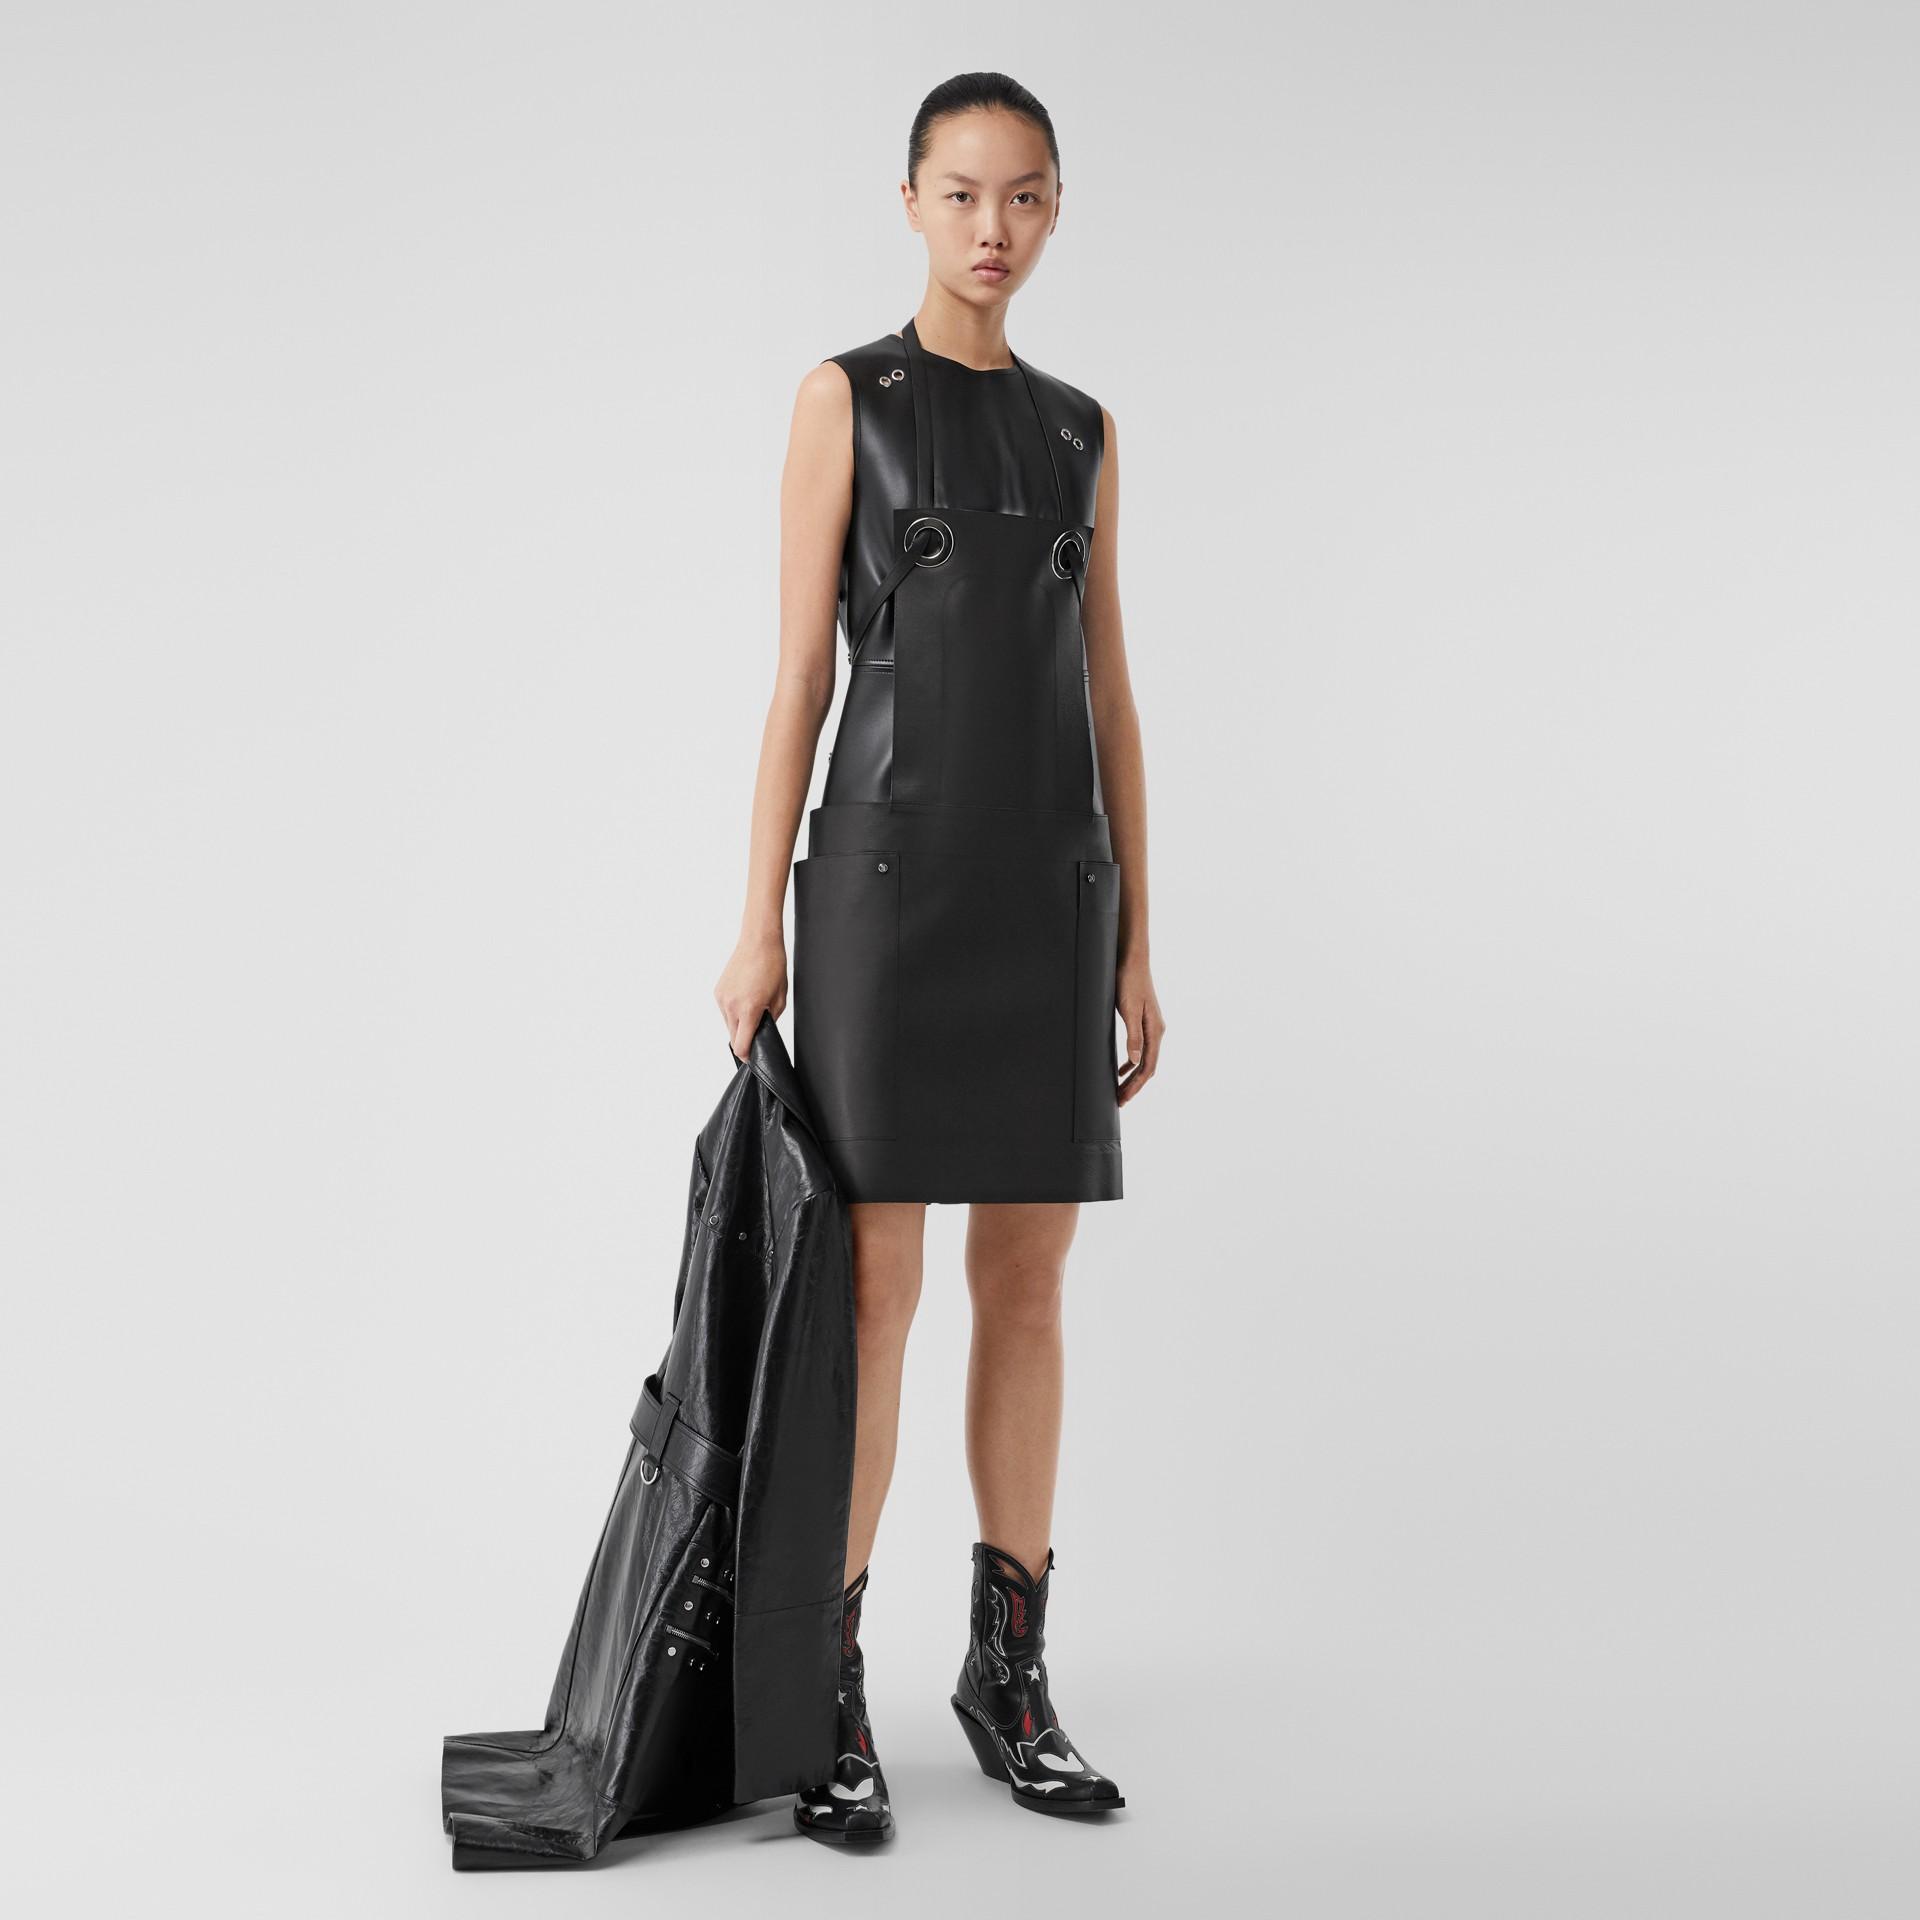 Eyelet Detail Leather Sleeveless Dress in Black - Women | Burberry - gallery image 0